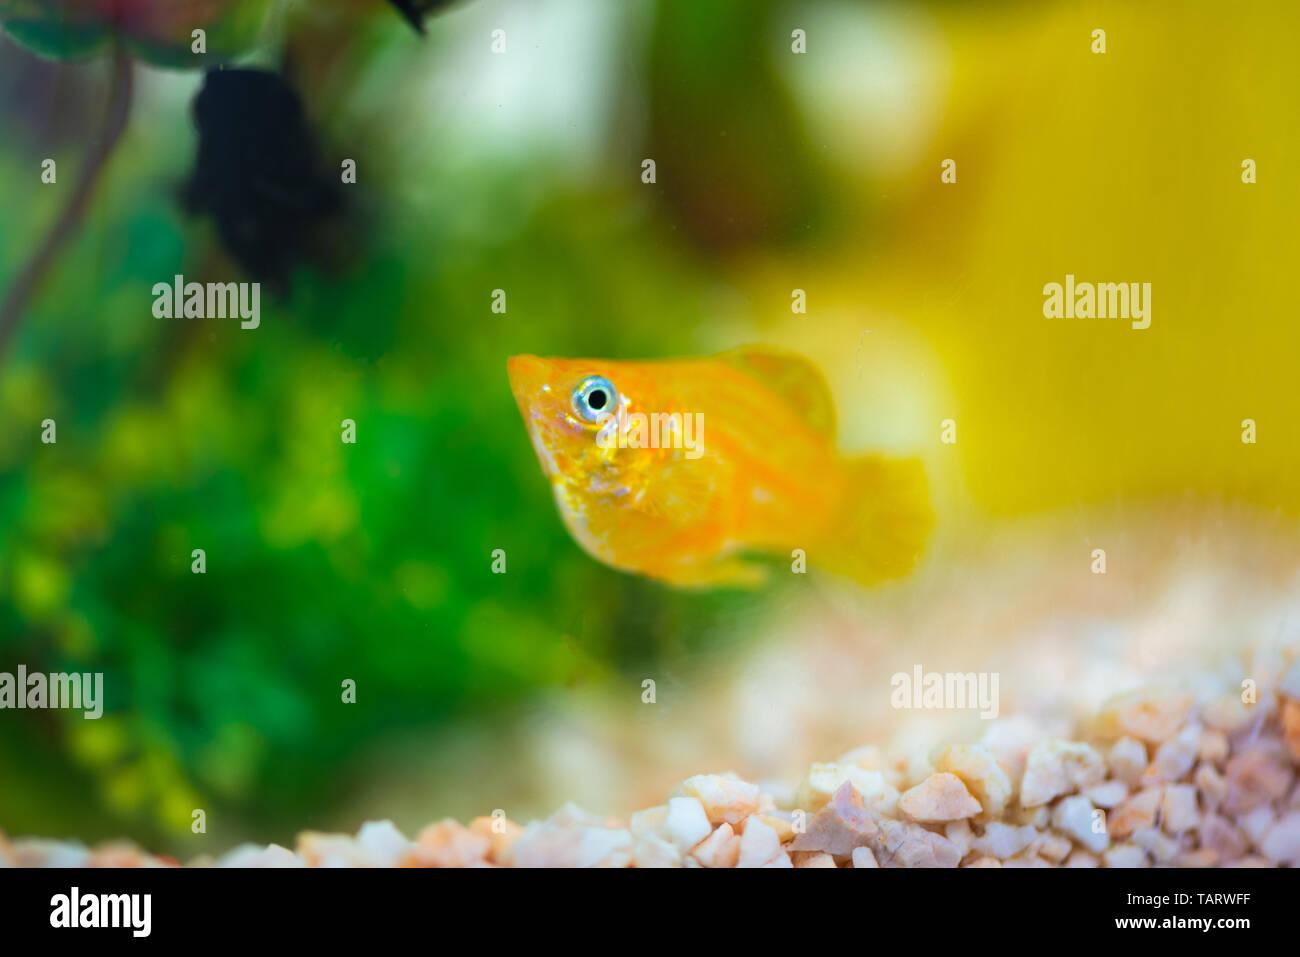 Little Molly fish, Poecilia latipinna in fish tank or aquarium, underwater life concept. Stock Photo